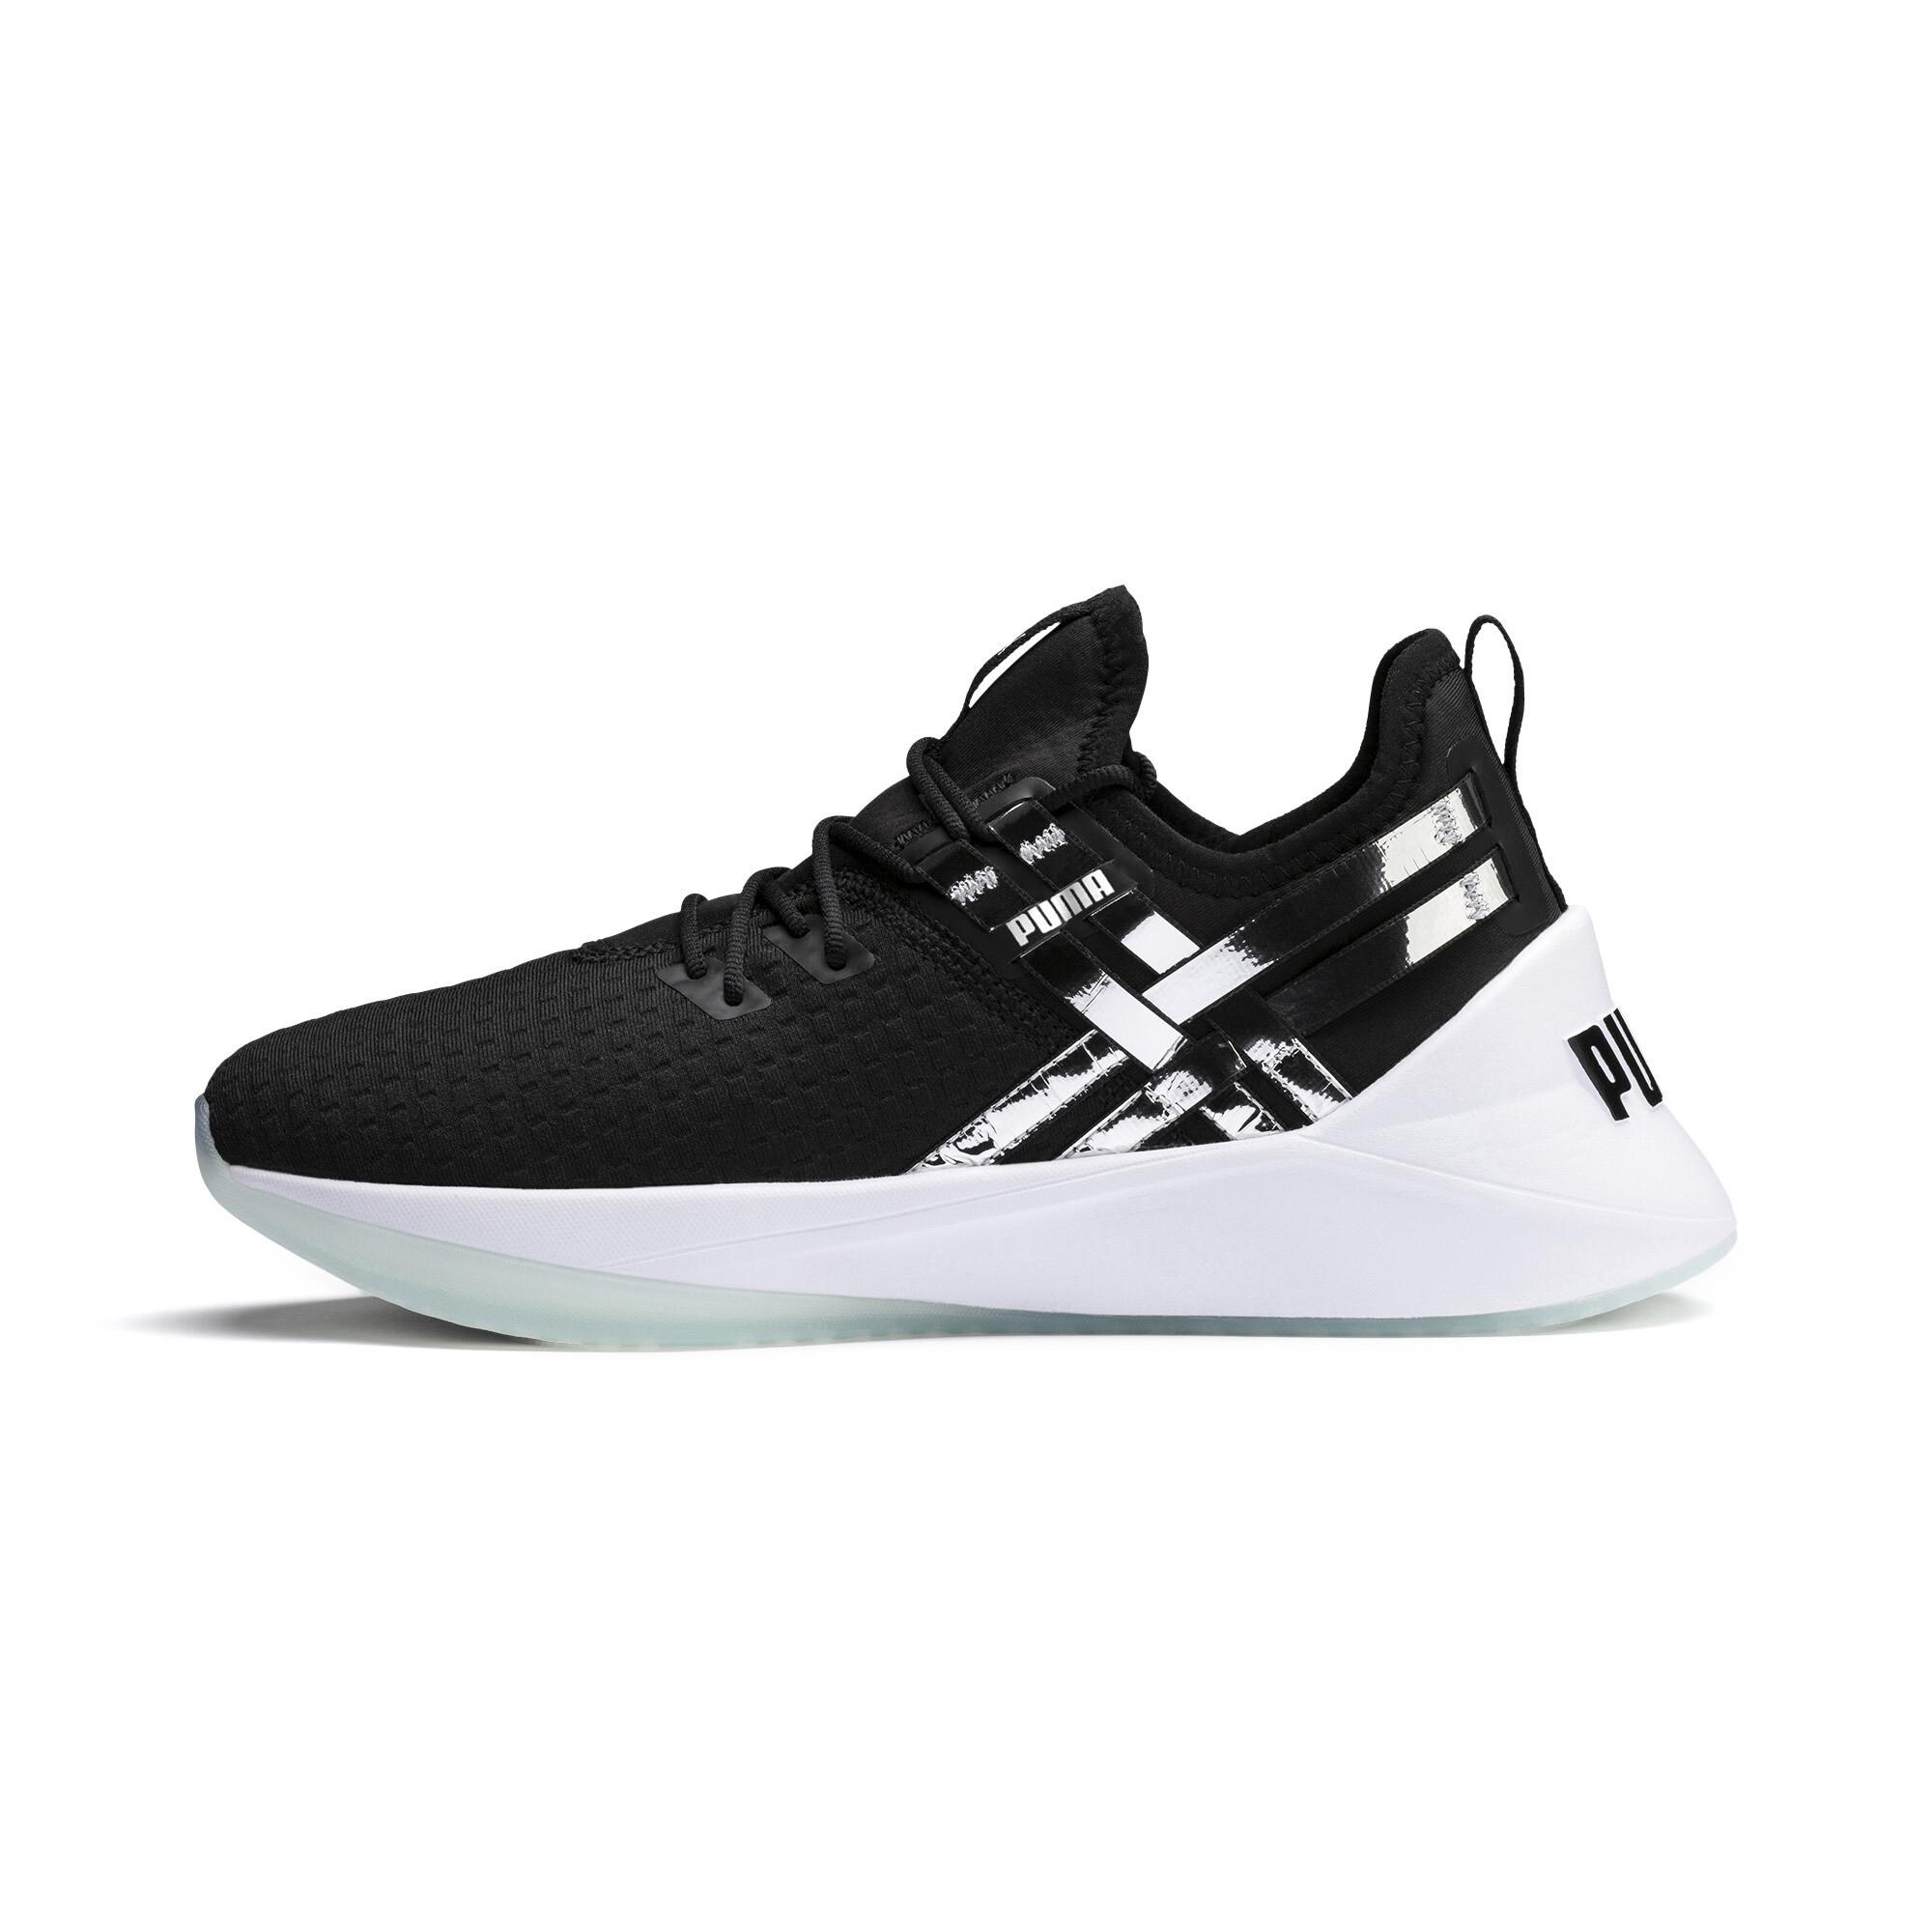 73548a8a Jaab XT TZ Women's Training Shoes | 20 - White | Puma